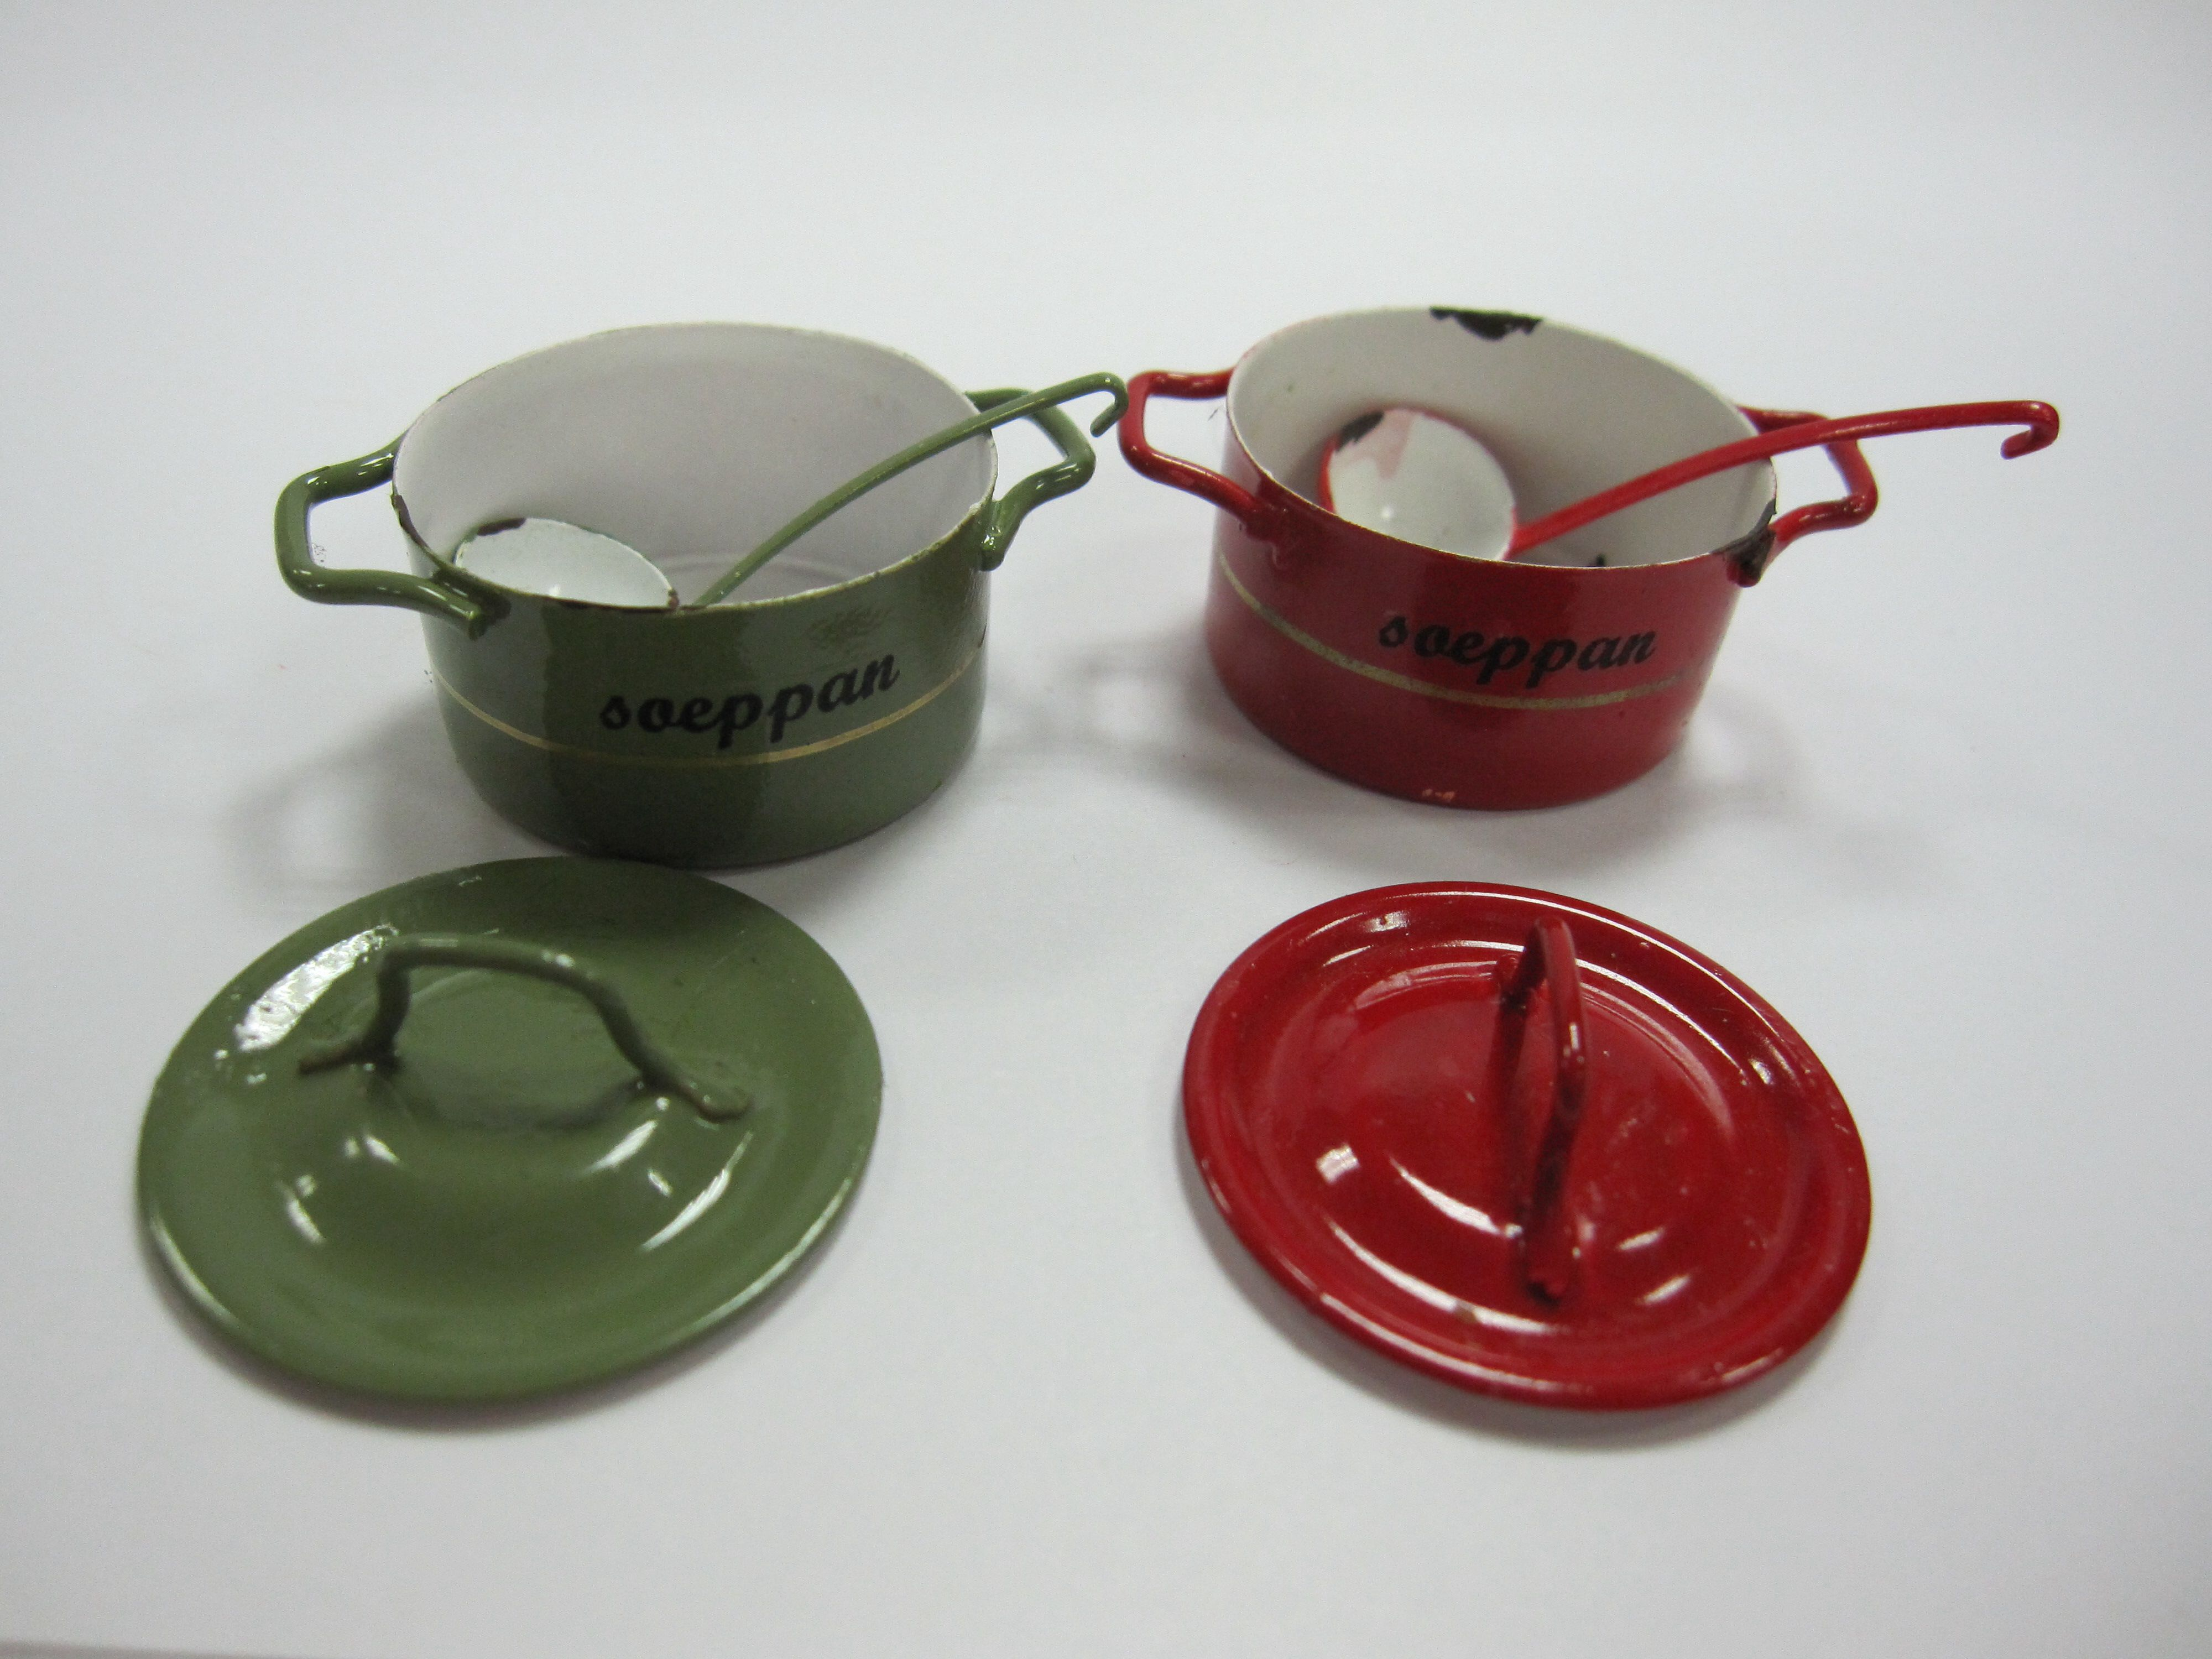 Aat Oukes Maakt Levensechte Miniaturen Miniature Poppenhuizen